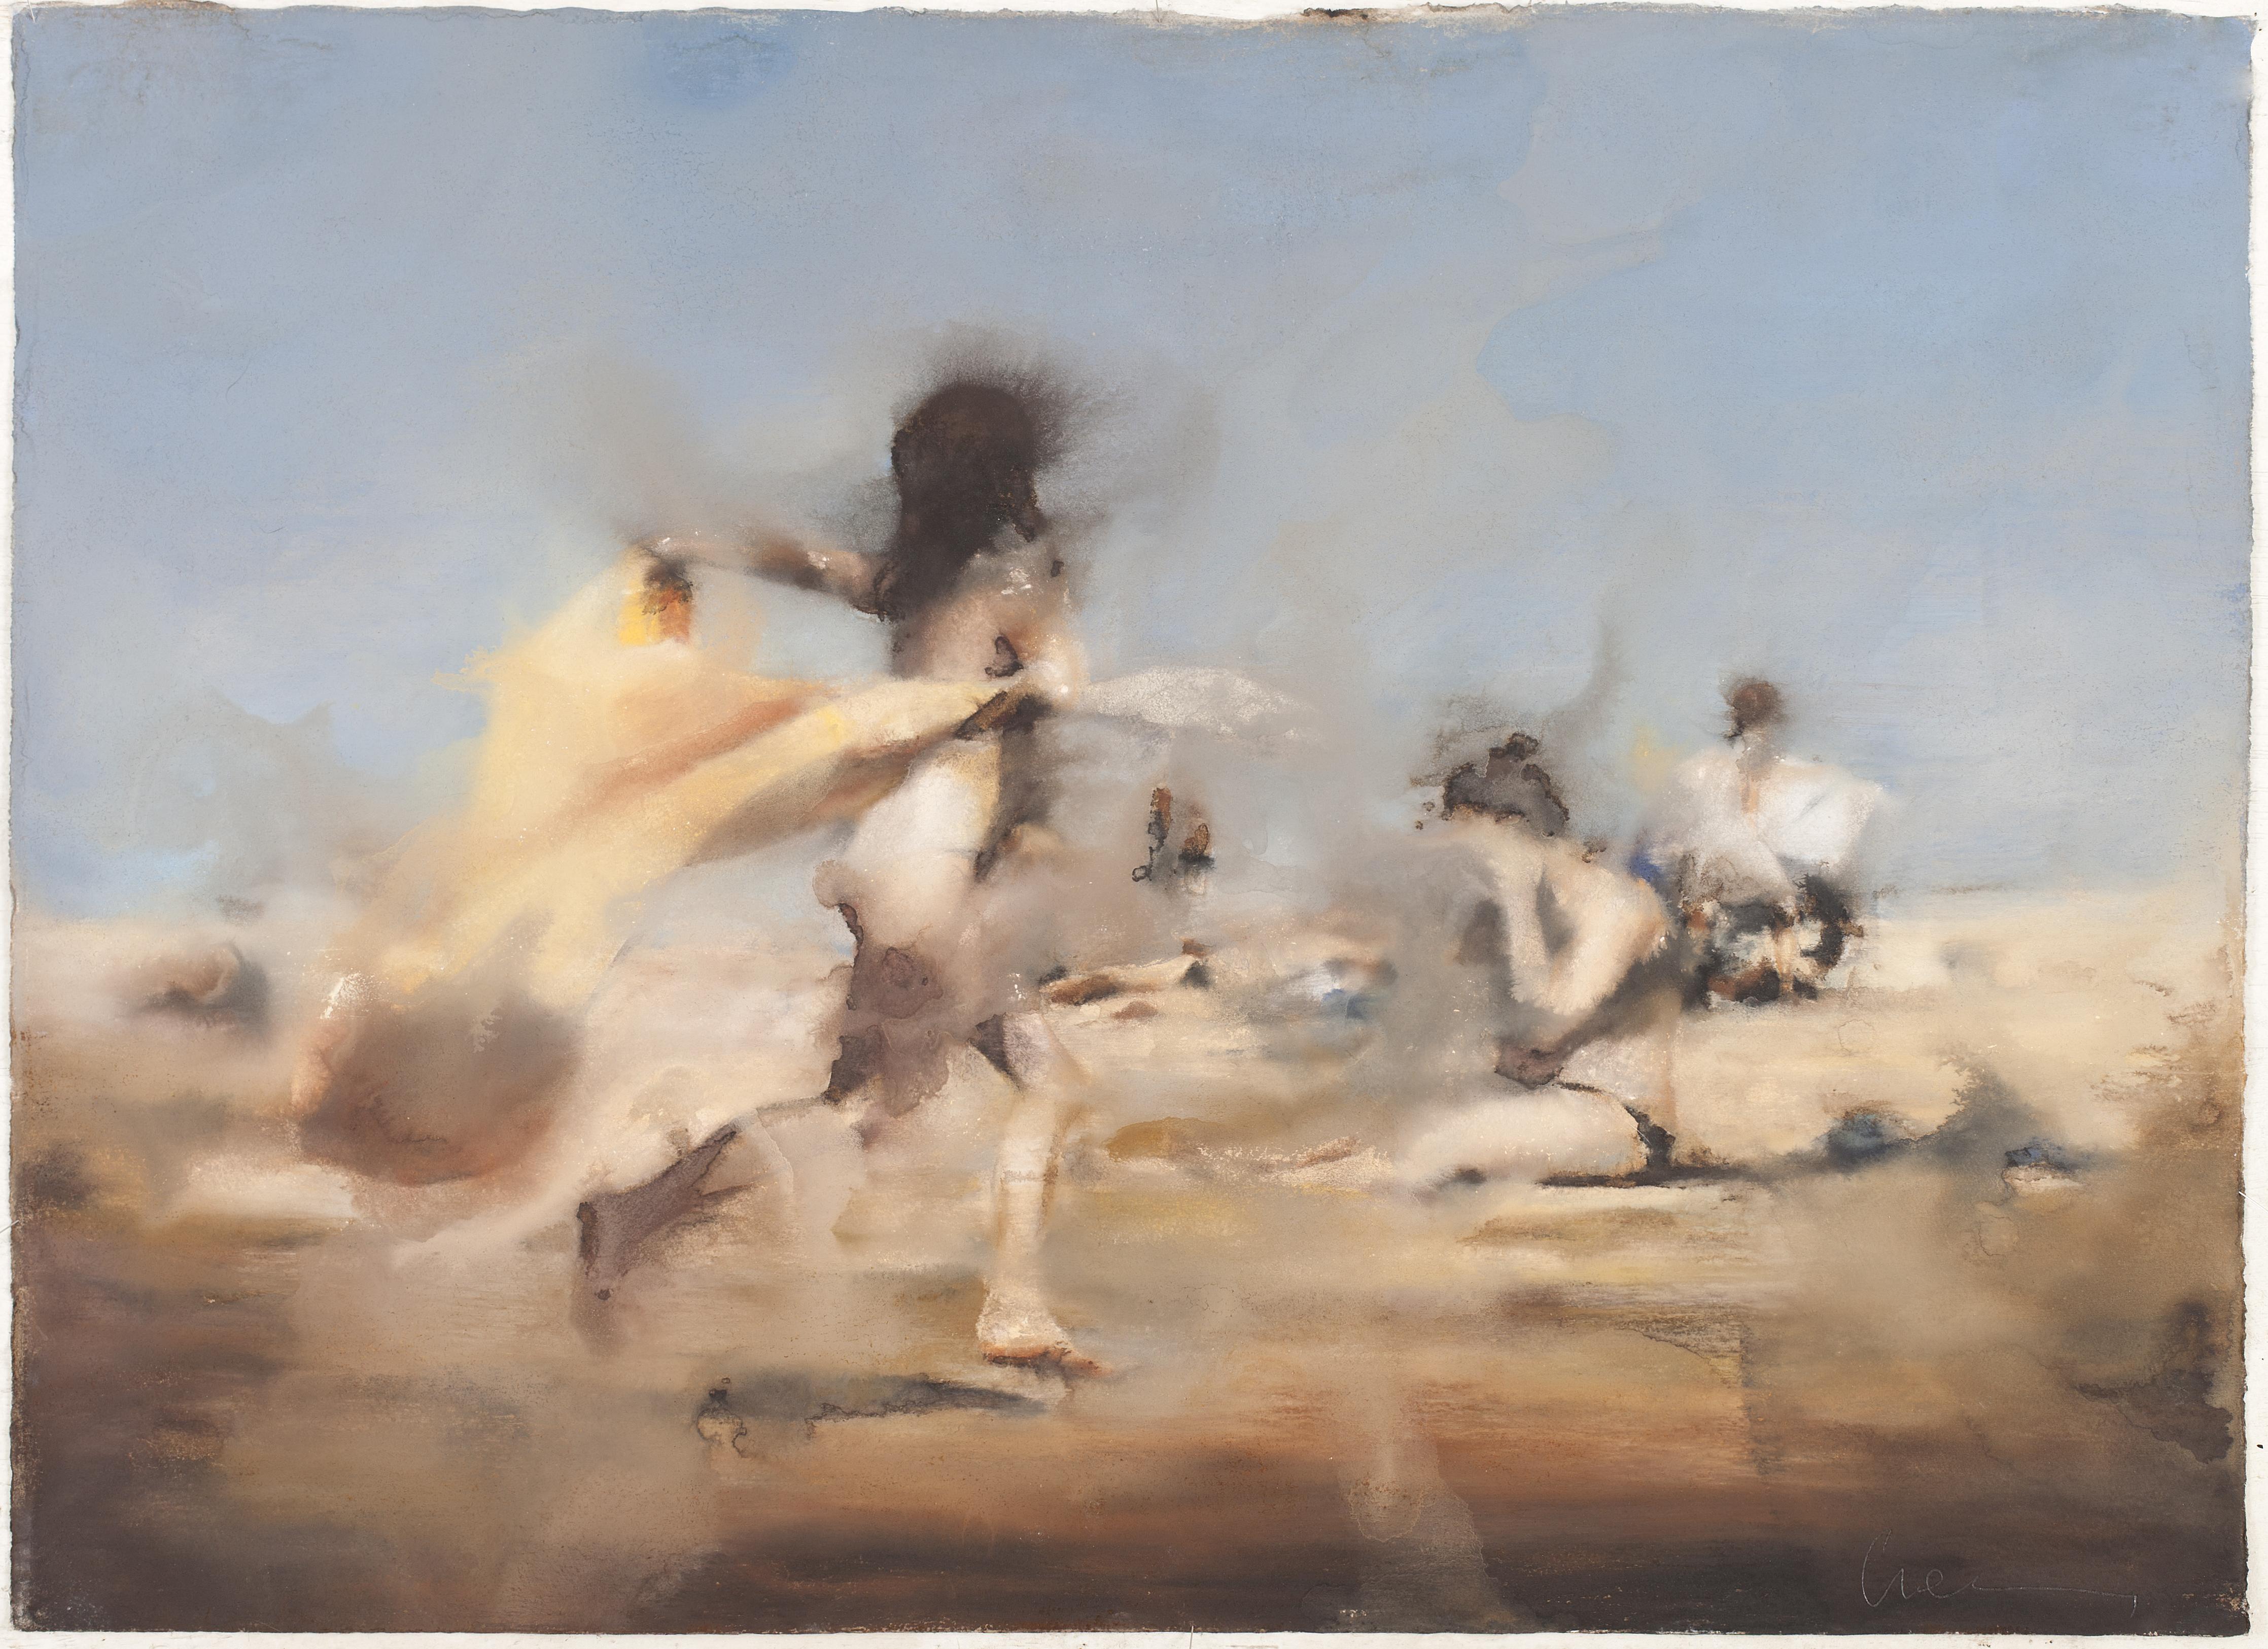 Peintres Ecole De Rouen yves crenn | hugo fine arts galerie | new york